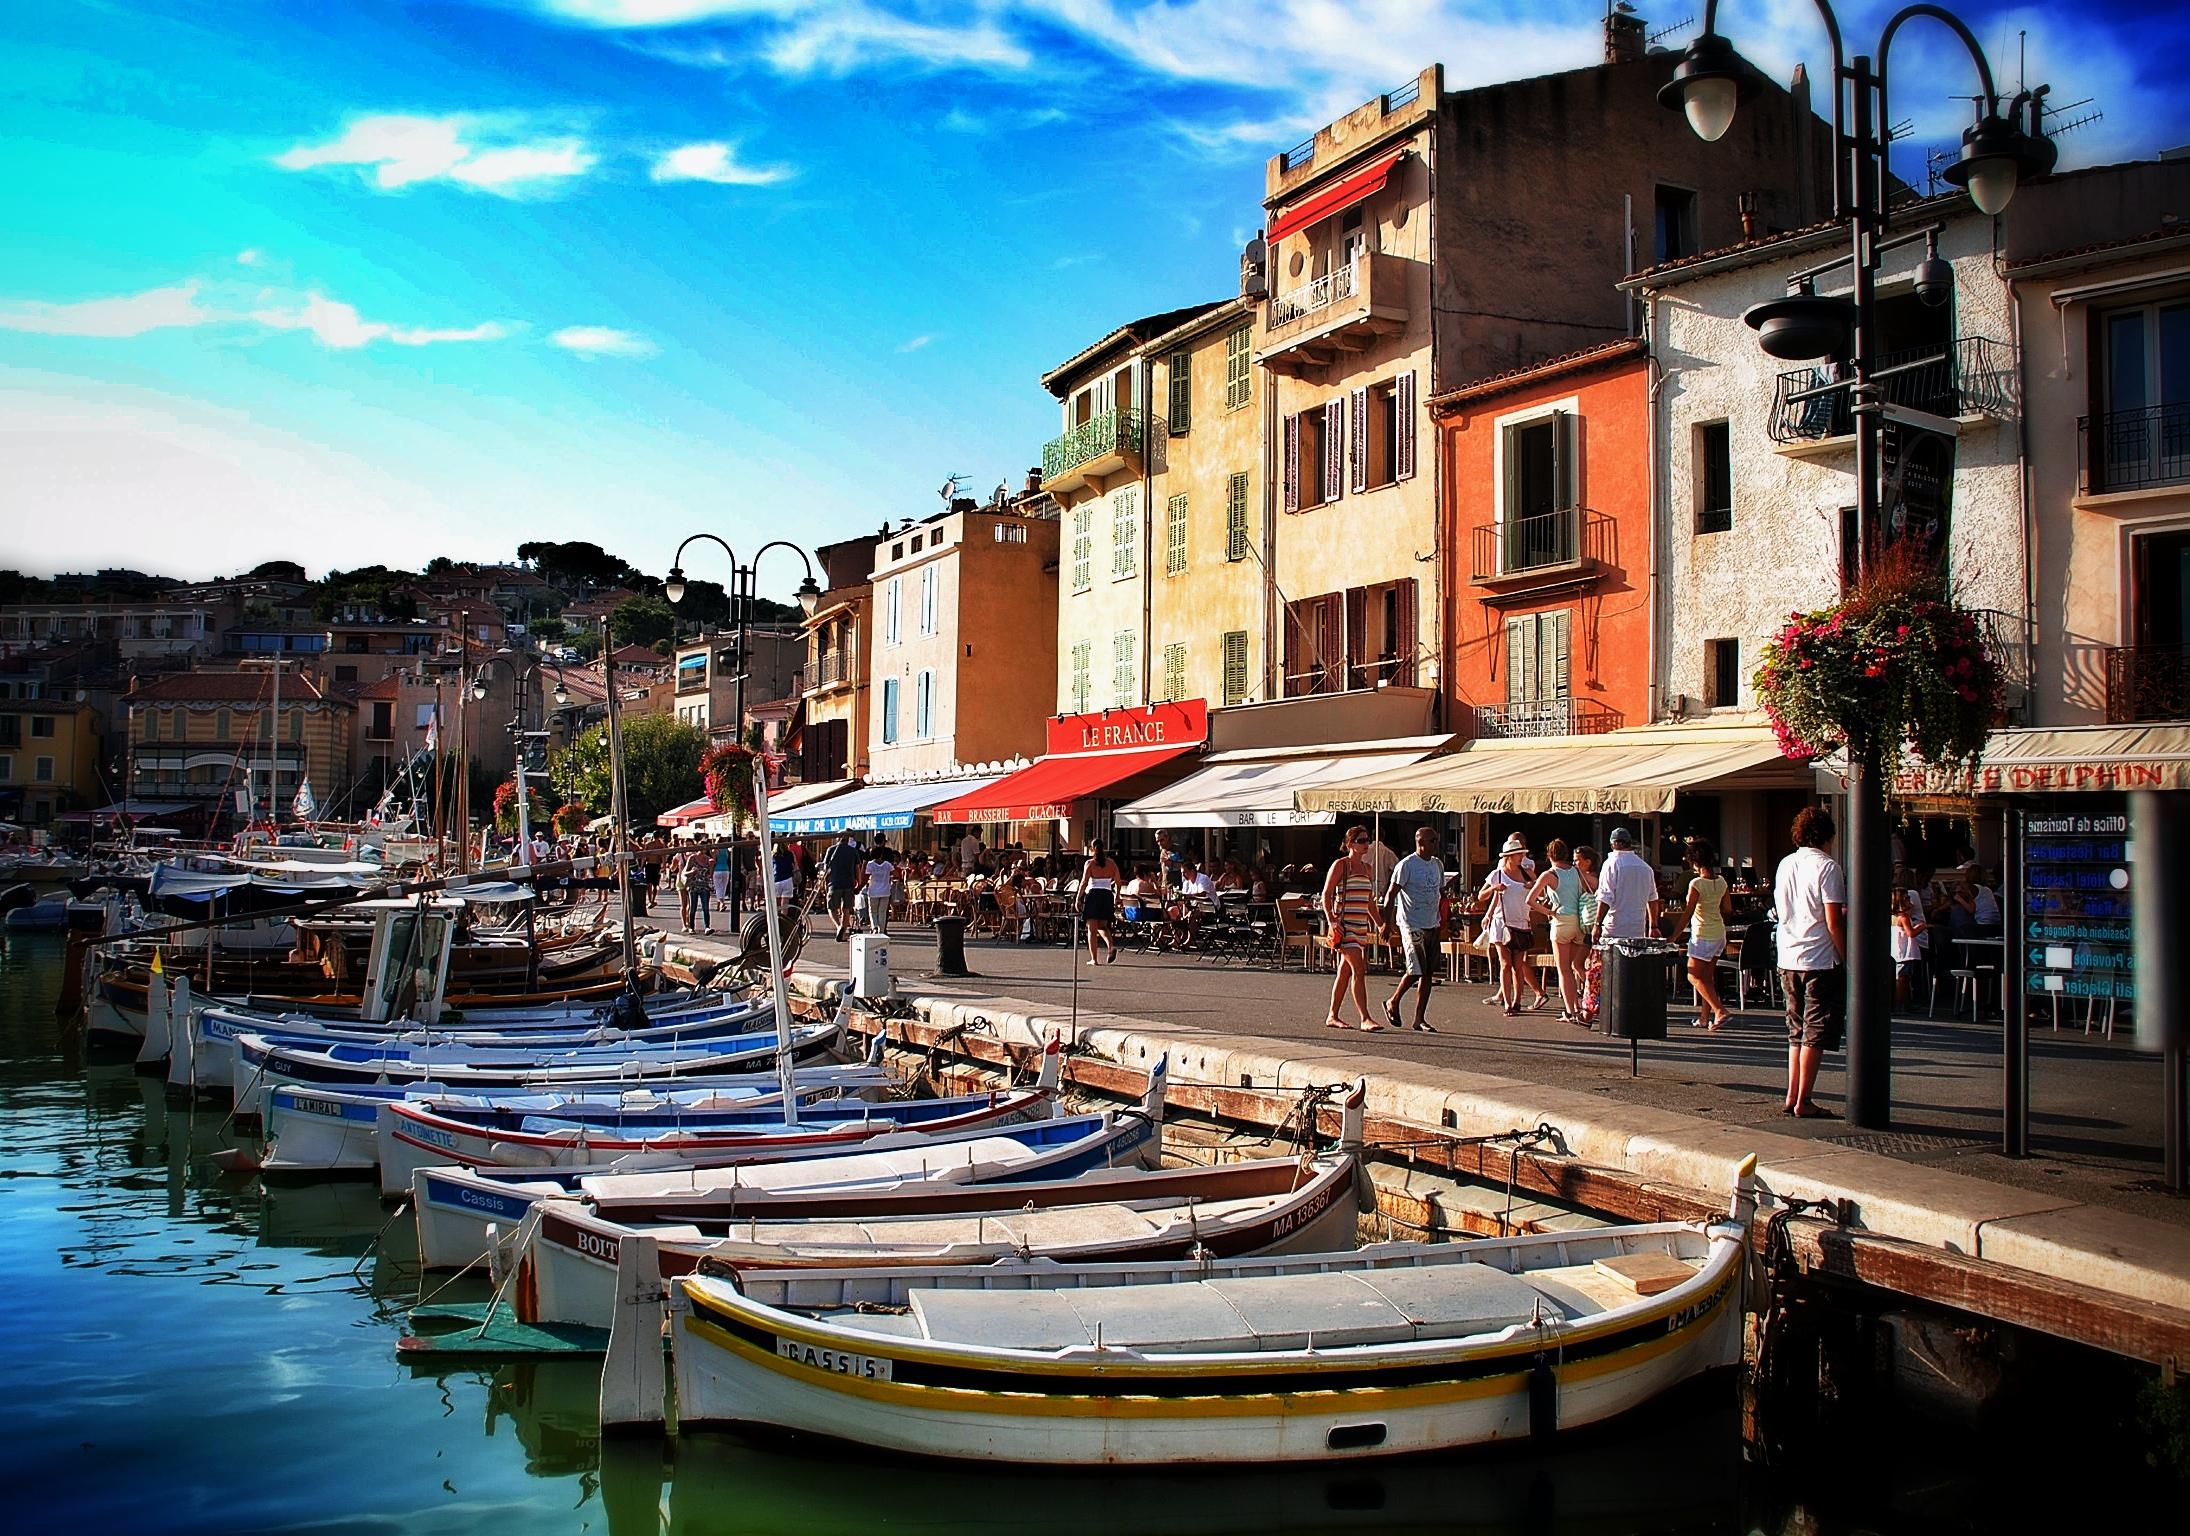 Noleggio Barche Cassis - Navalia | Noleggia un Sogno